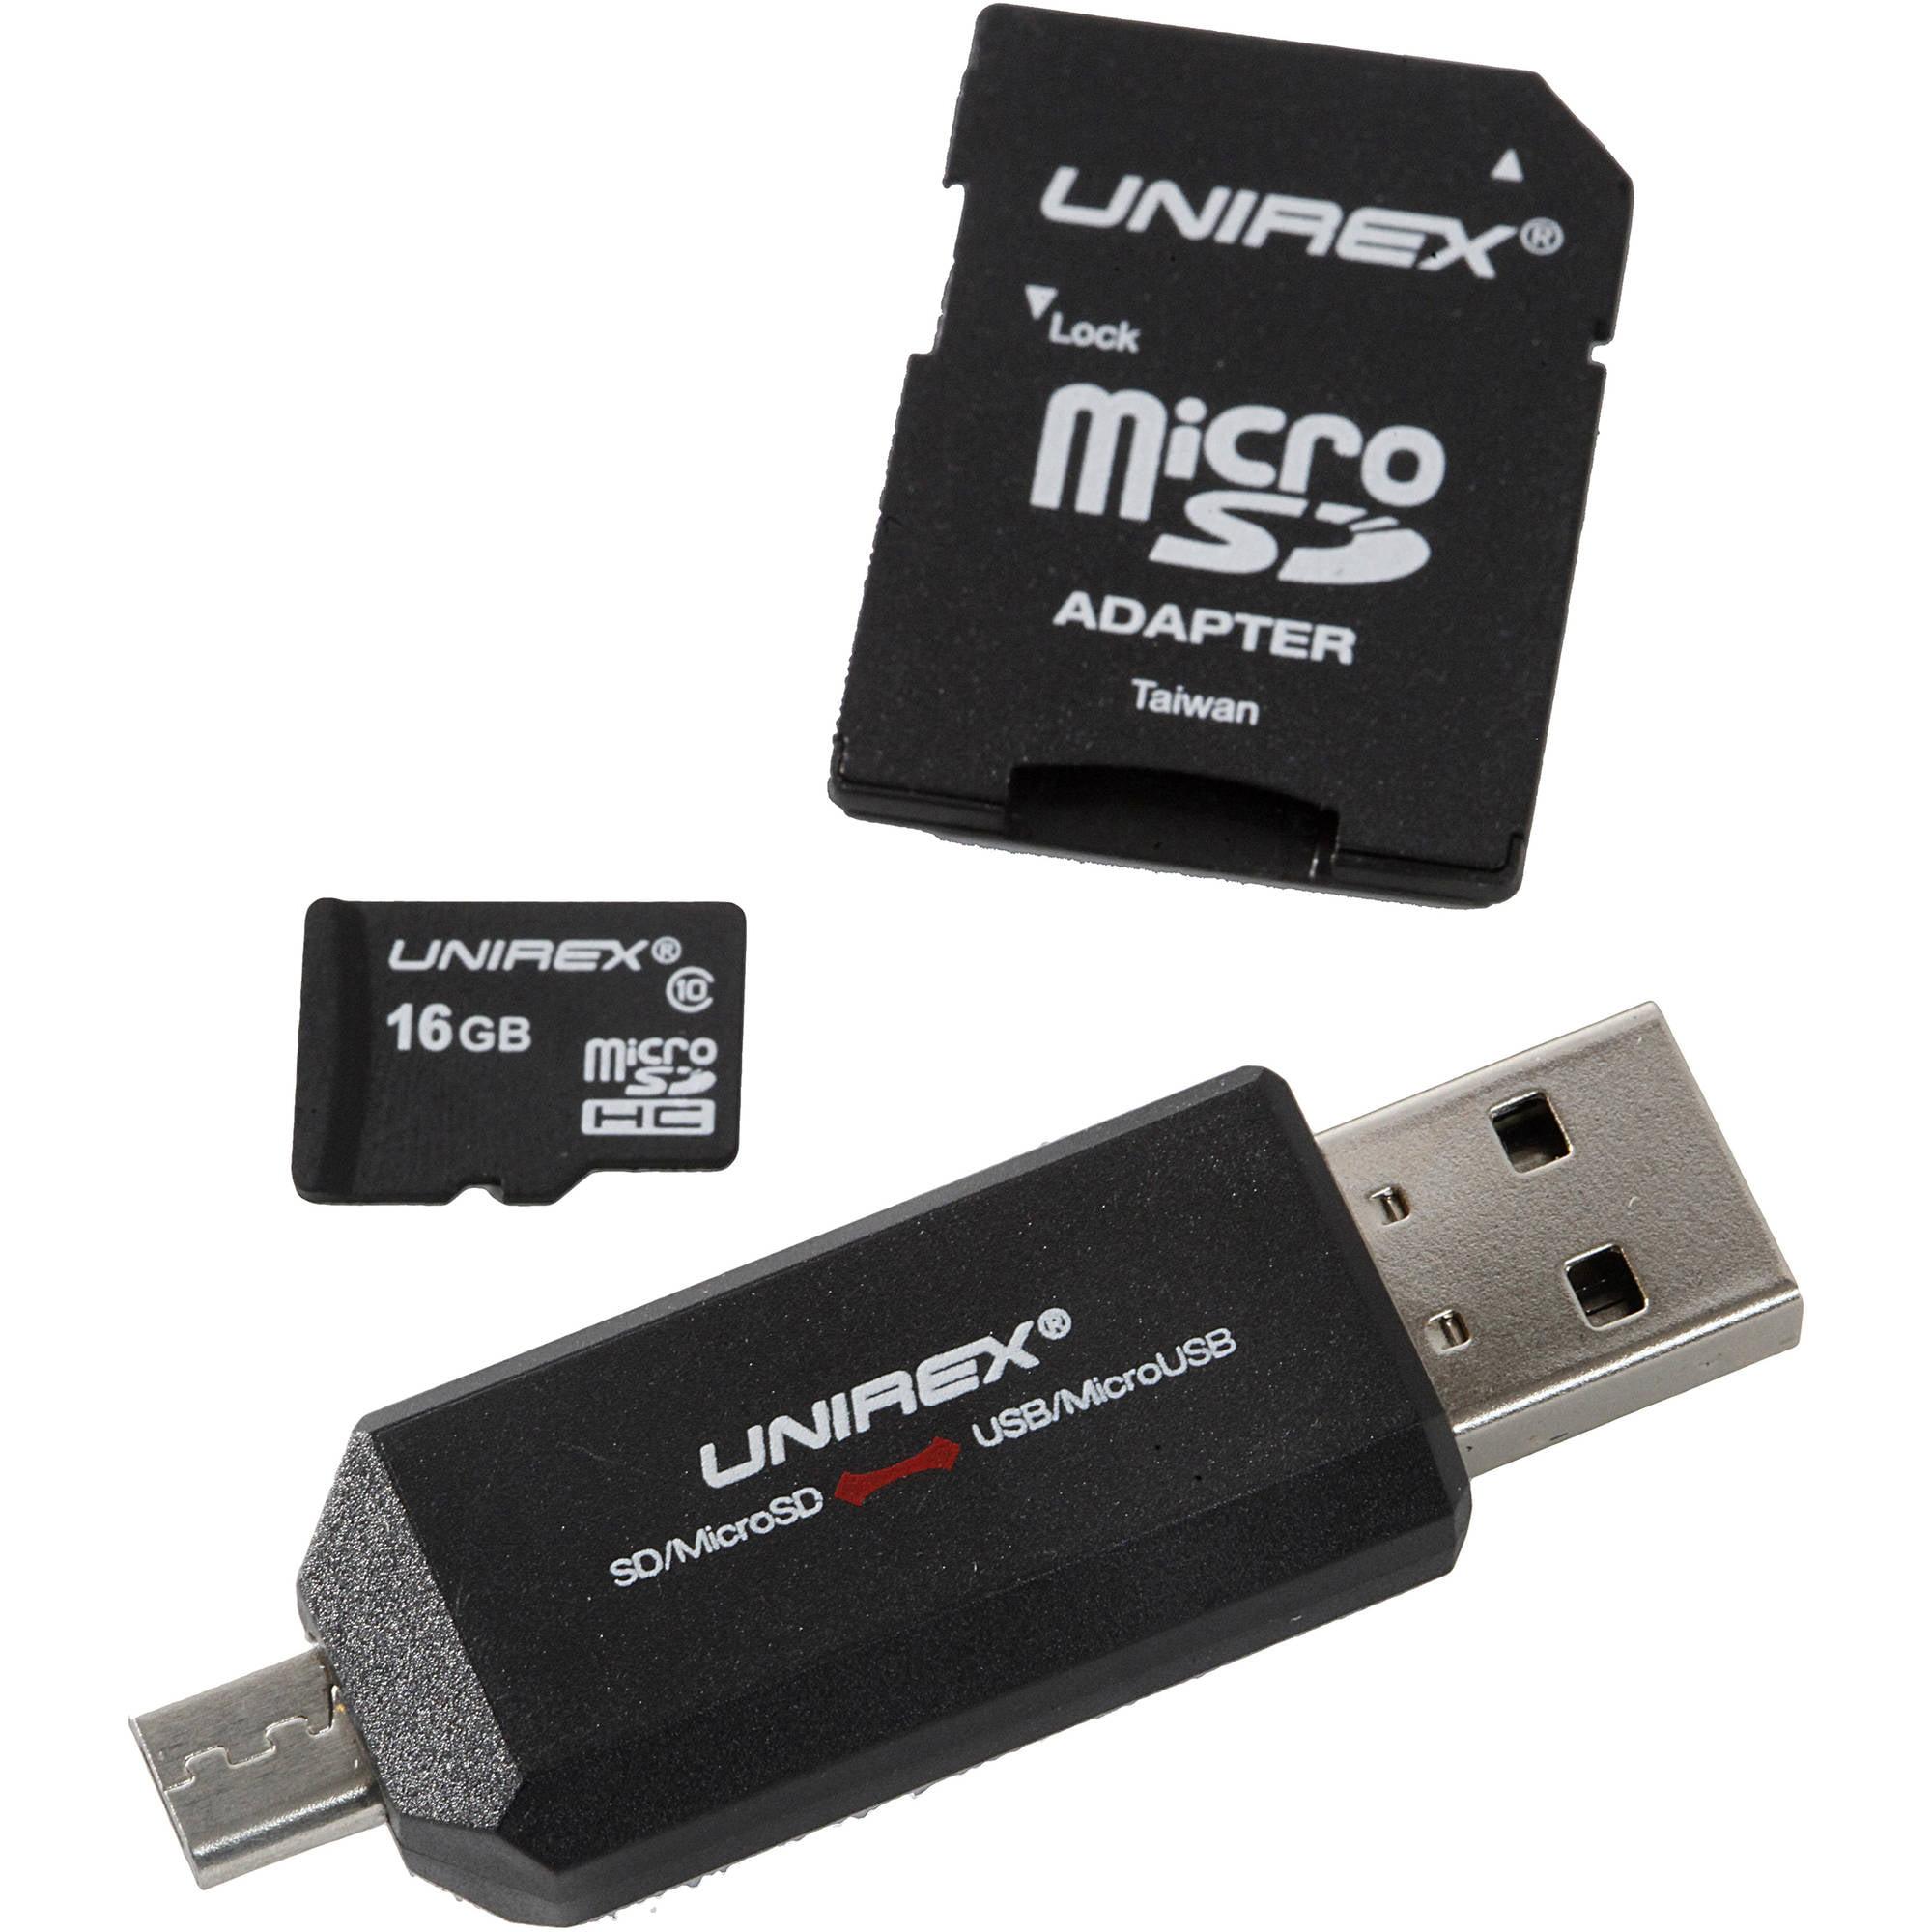 Unirex microSD 16GB Class 4 with USB/microUSB Reader